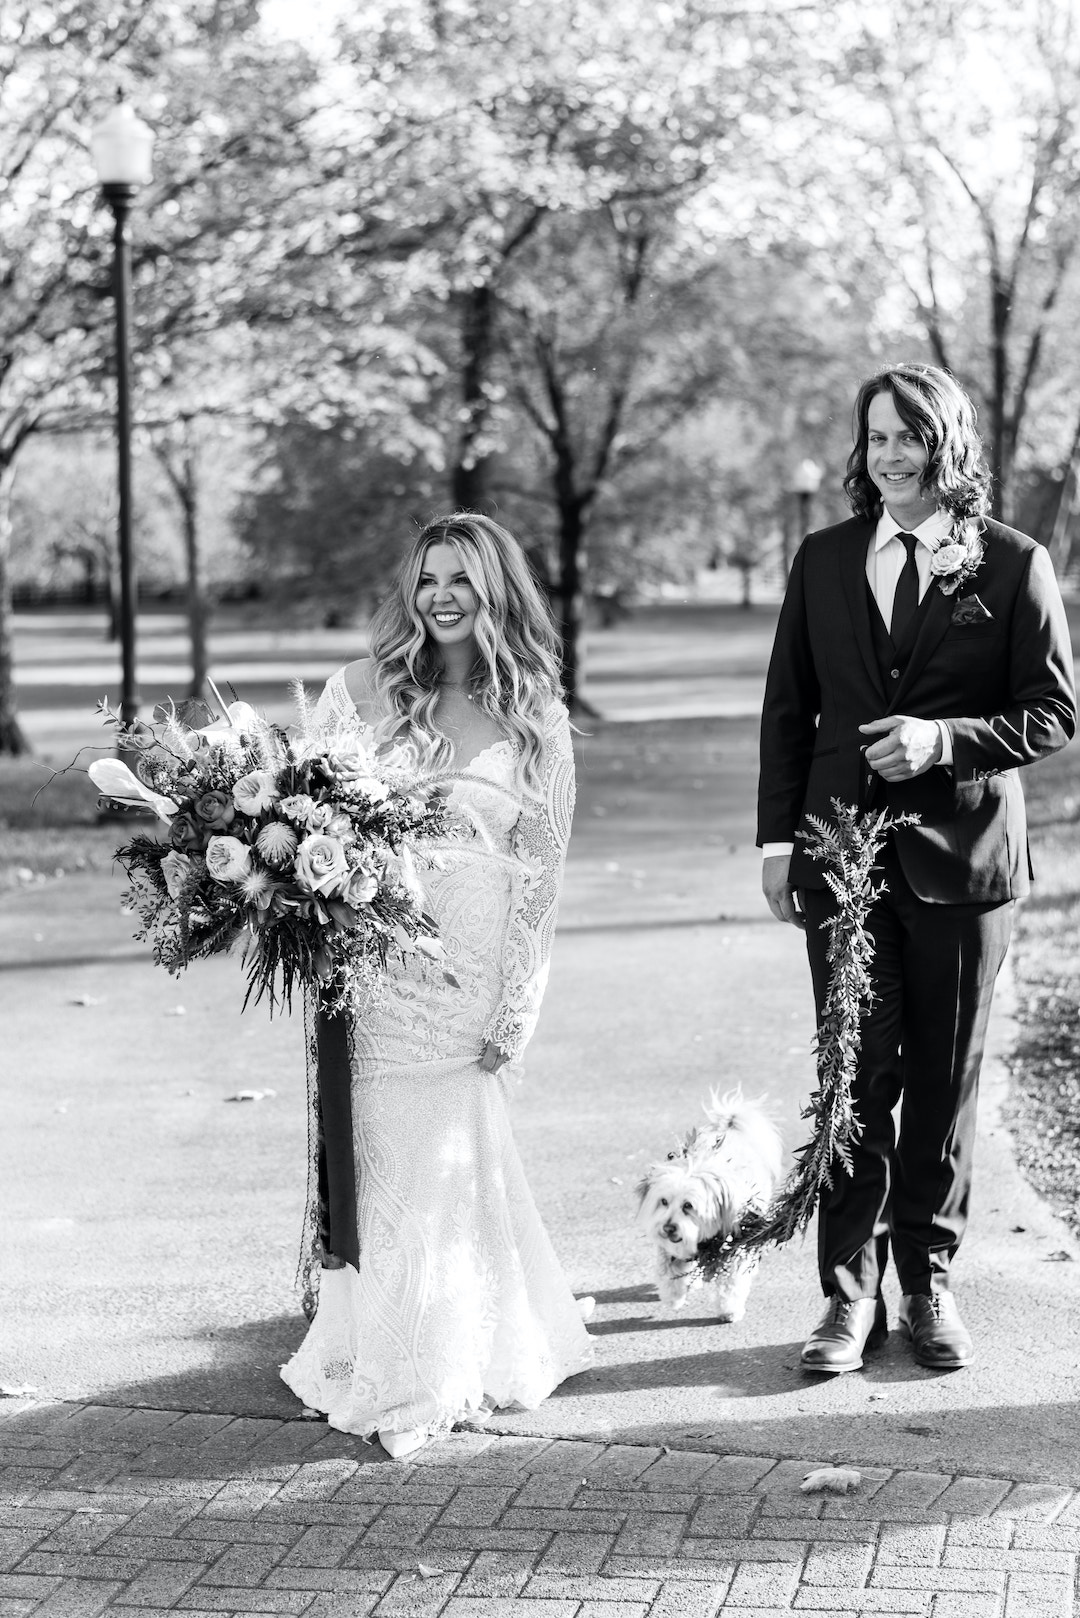 Someplace Wild wedding photography